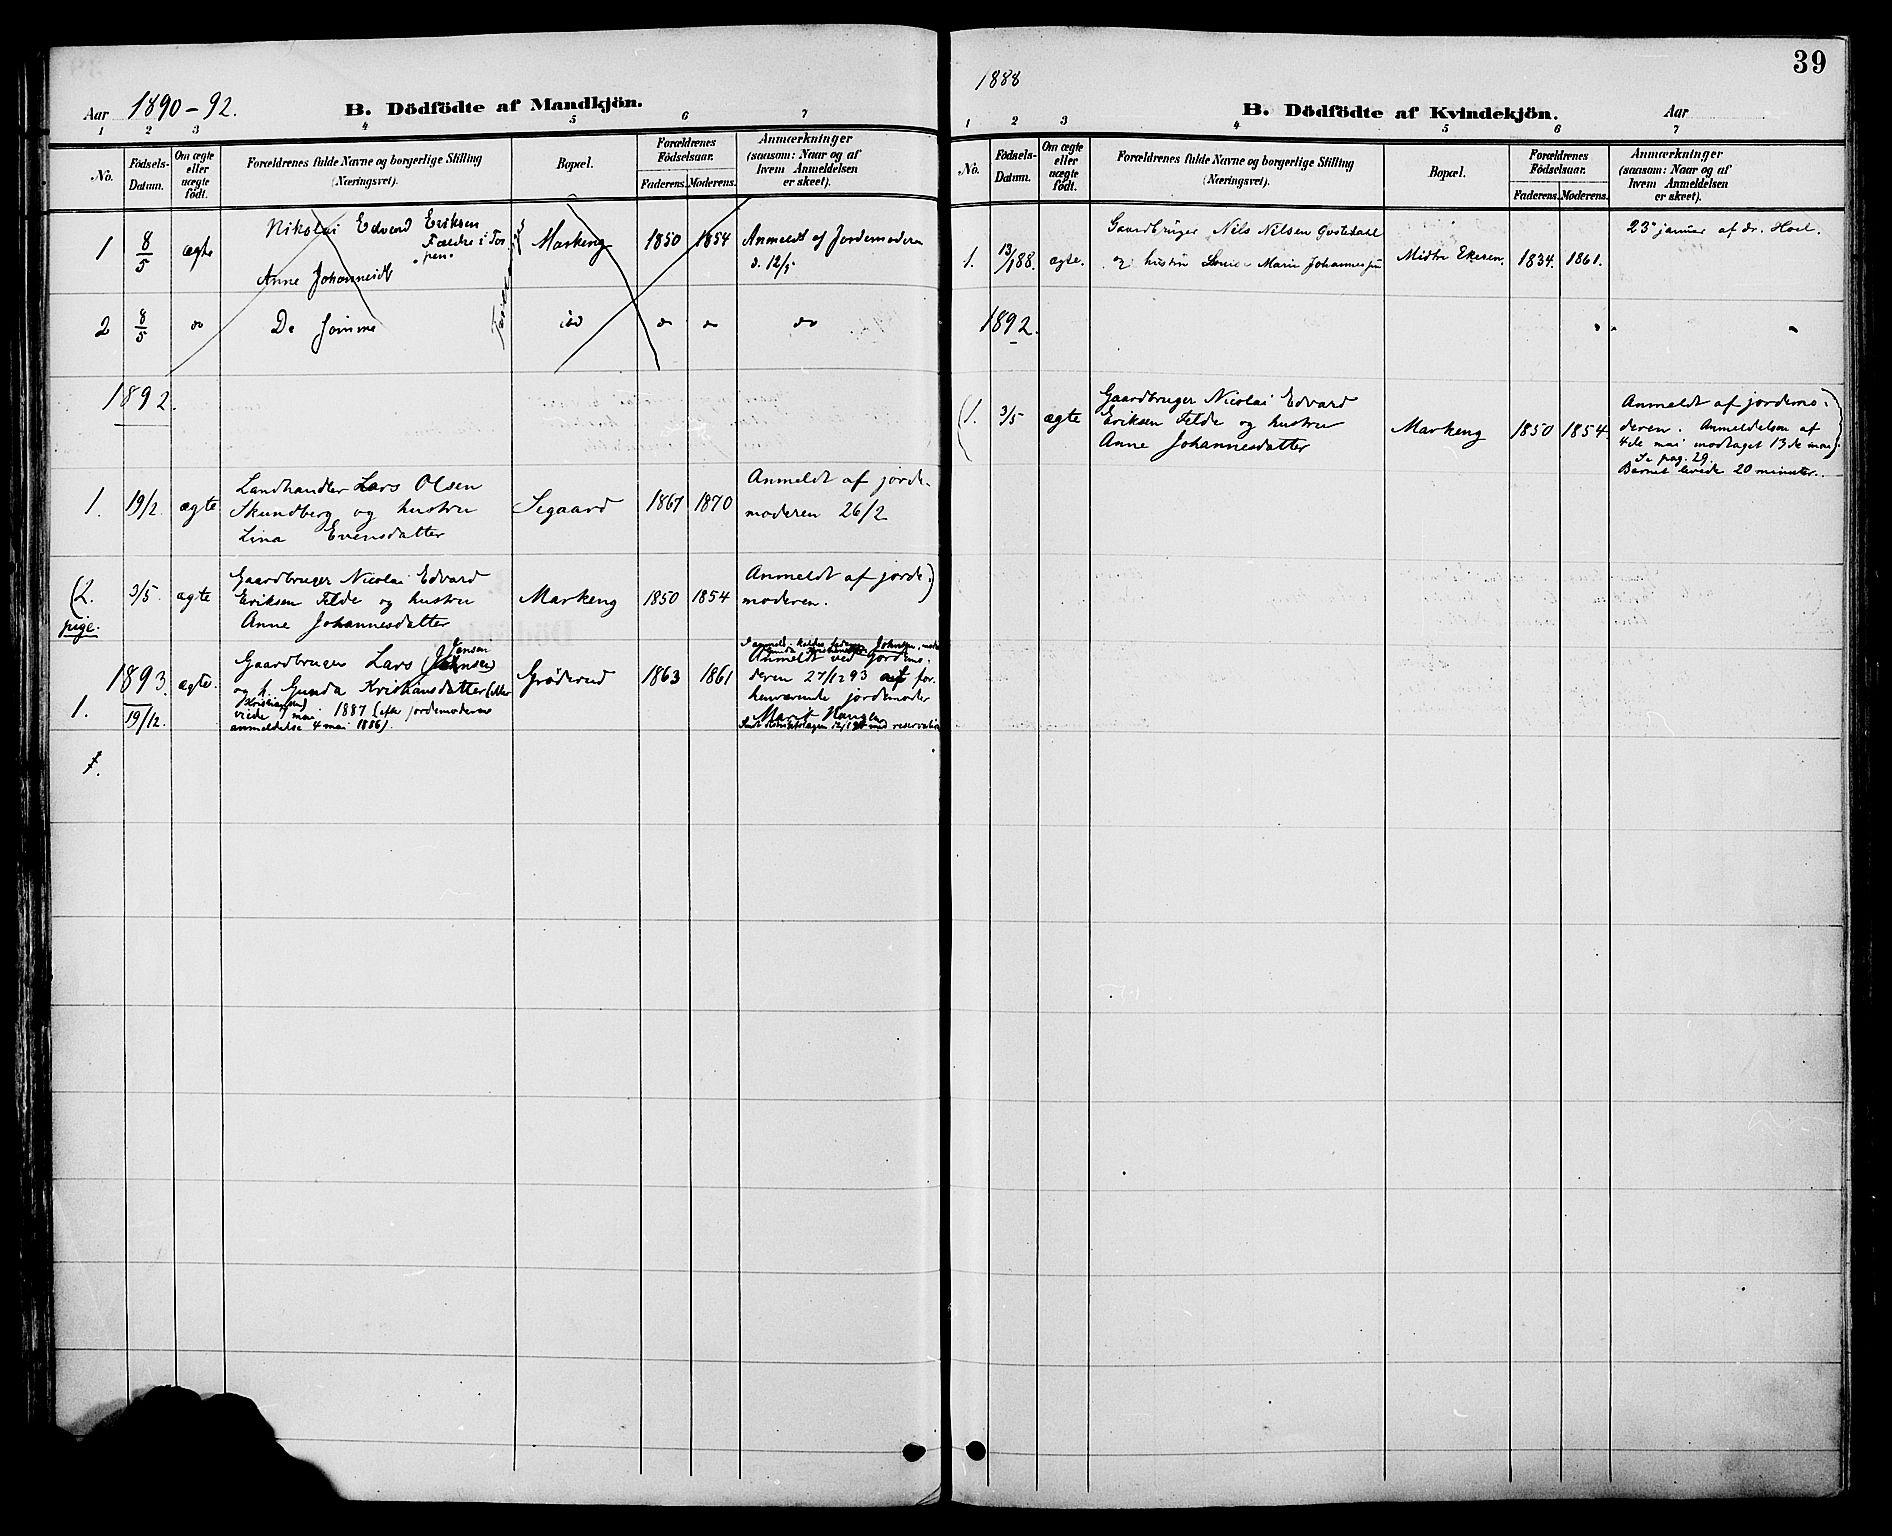 SAH, Biri prestekontor, Ministerialbok nr. 7, 1887-1893, s. 39